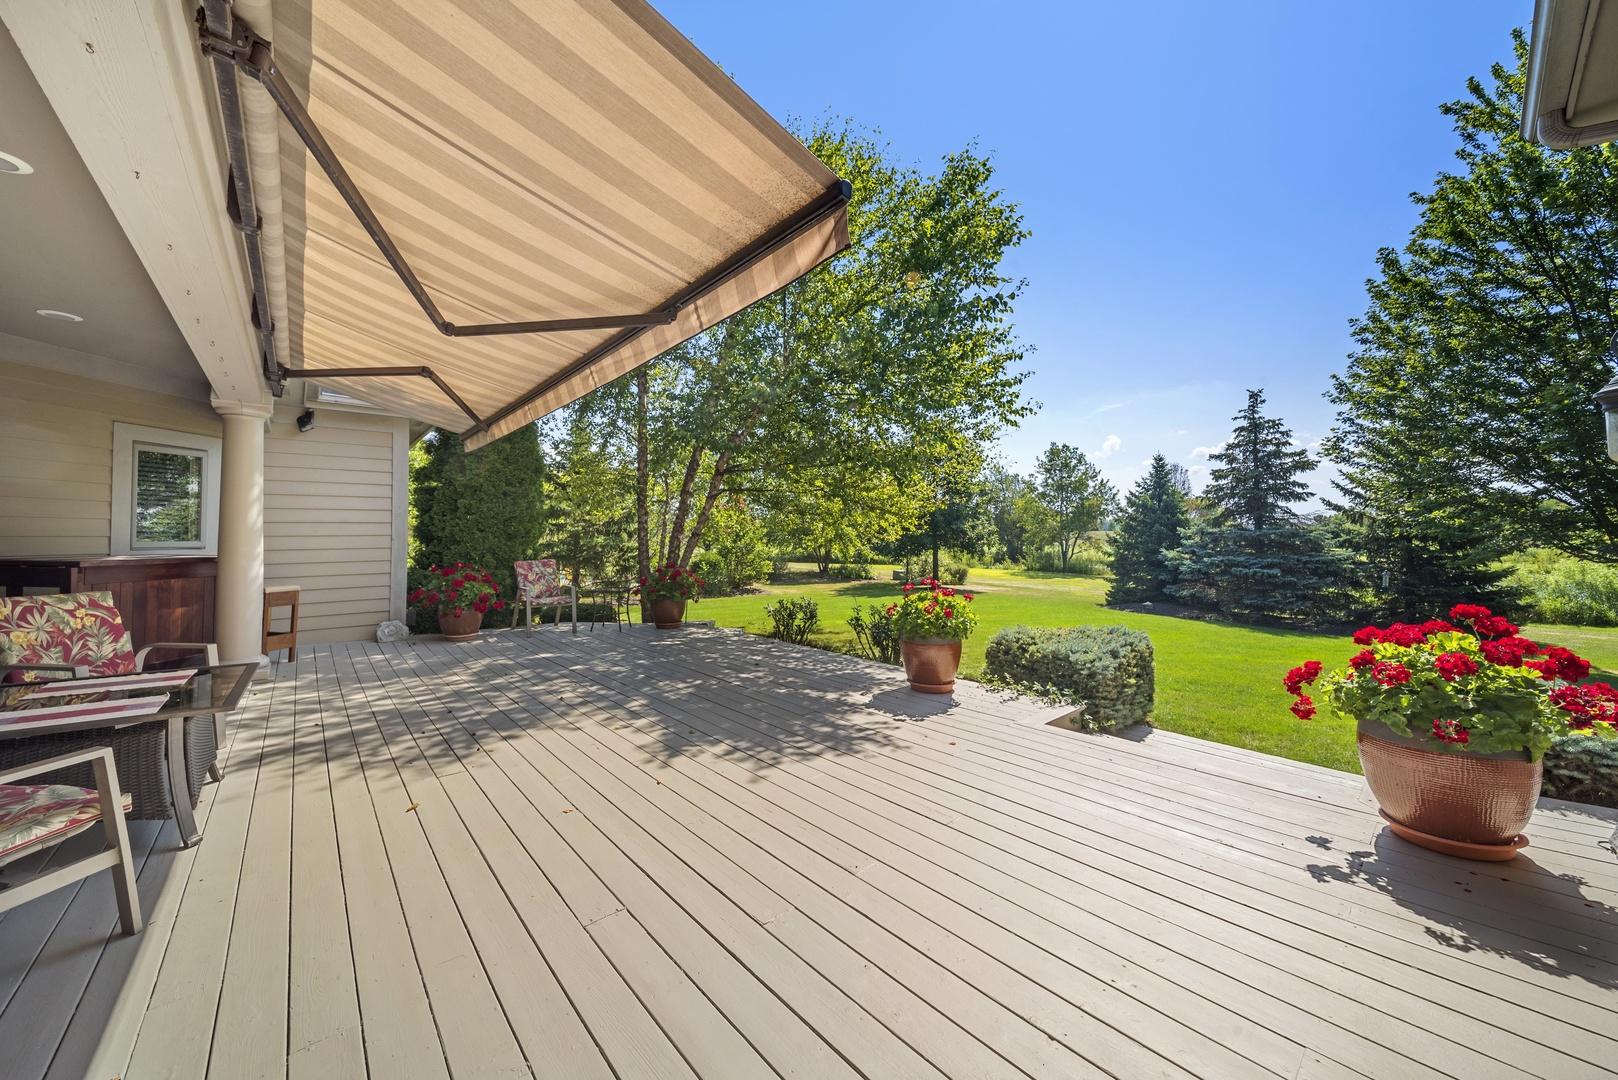 9455 Nicklaus, Lakewood, Illinois, 60014